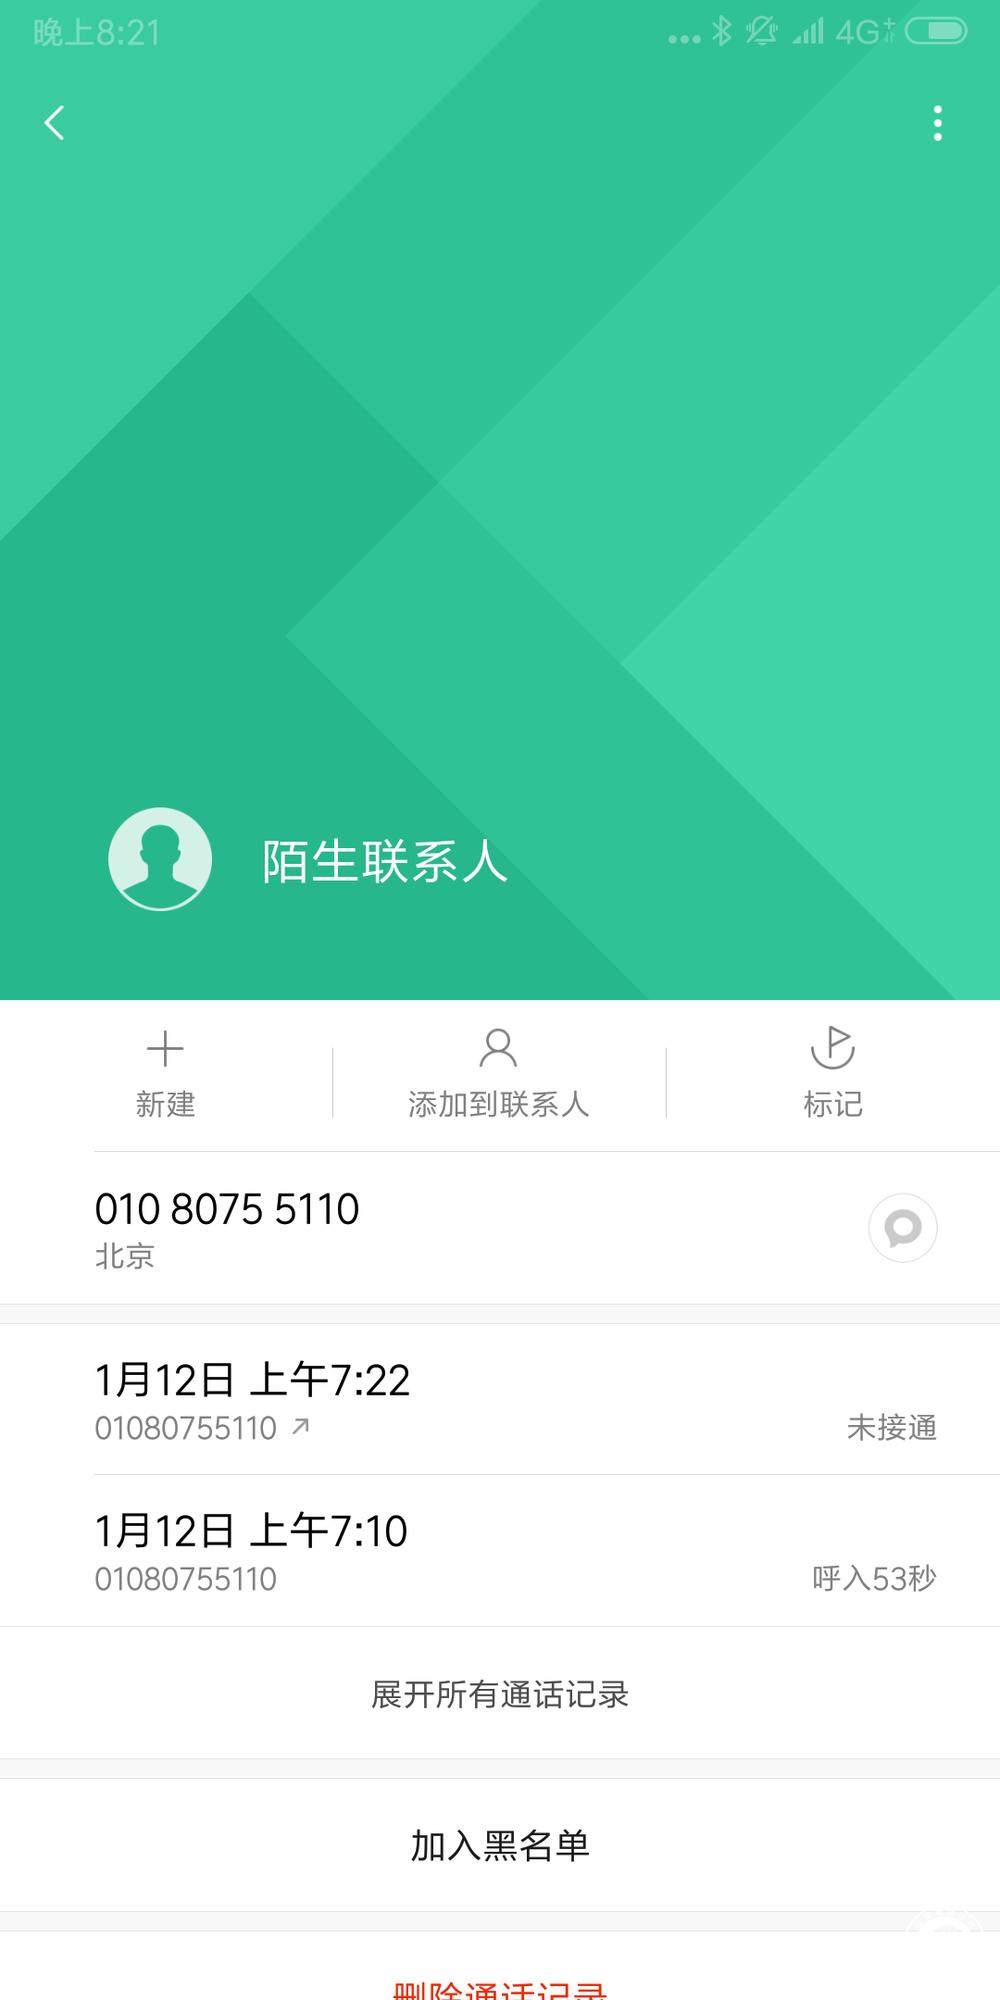 QQ图片20200114171636.png